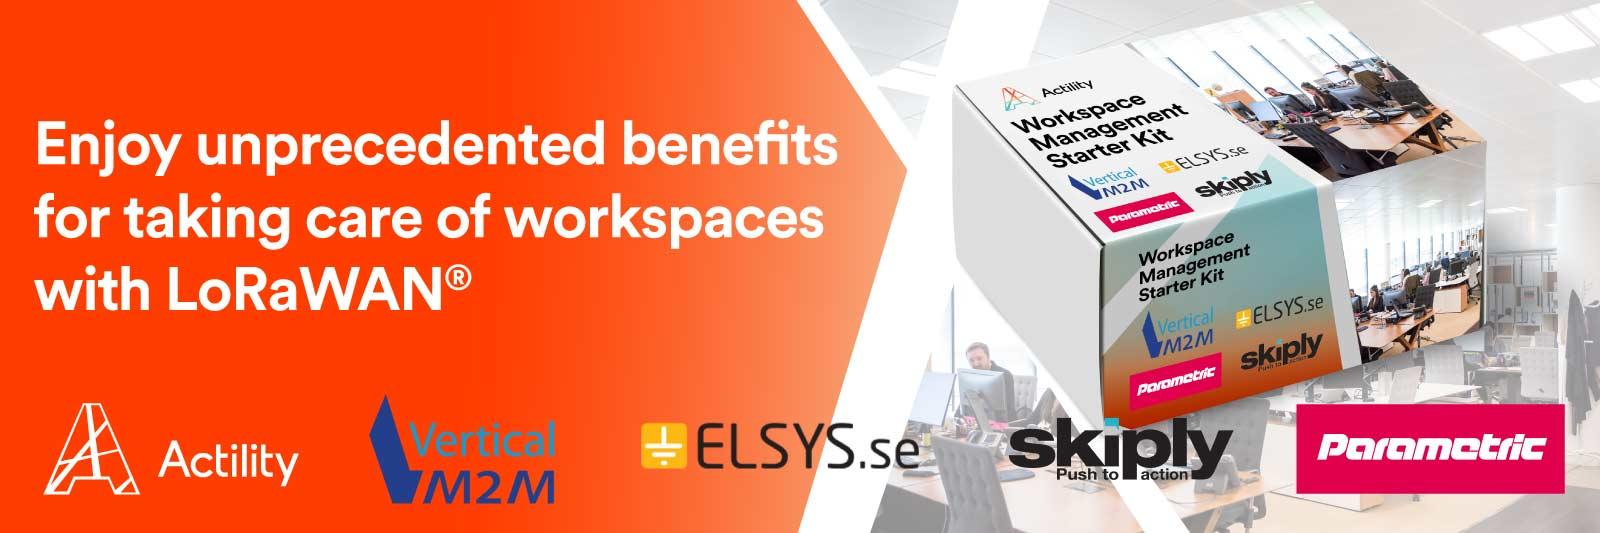 Workplace management press release Header